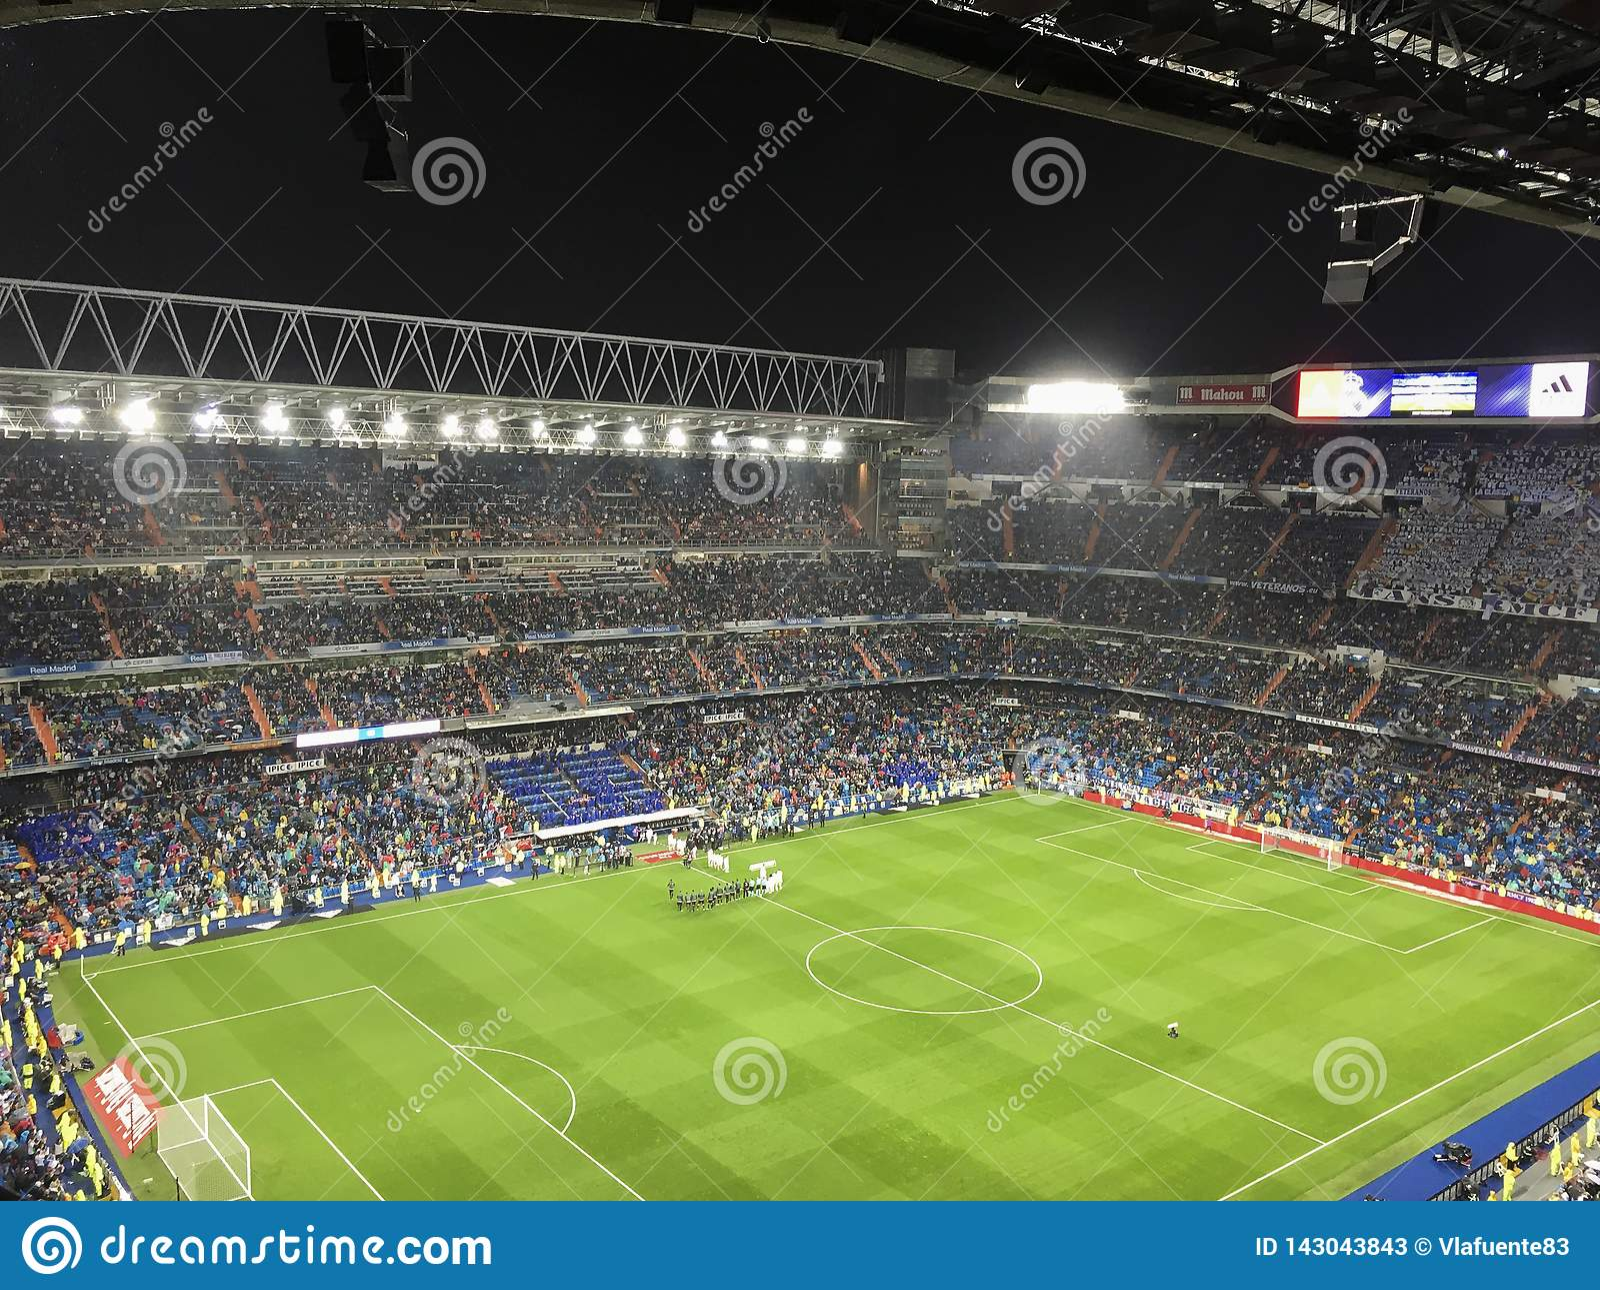 Santiago Bernabeu Stadium during a Real Madrid match in 2016